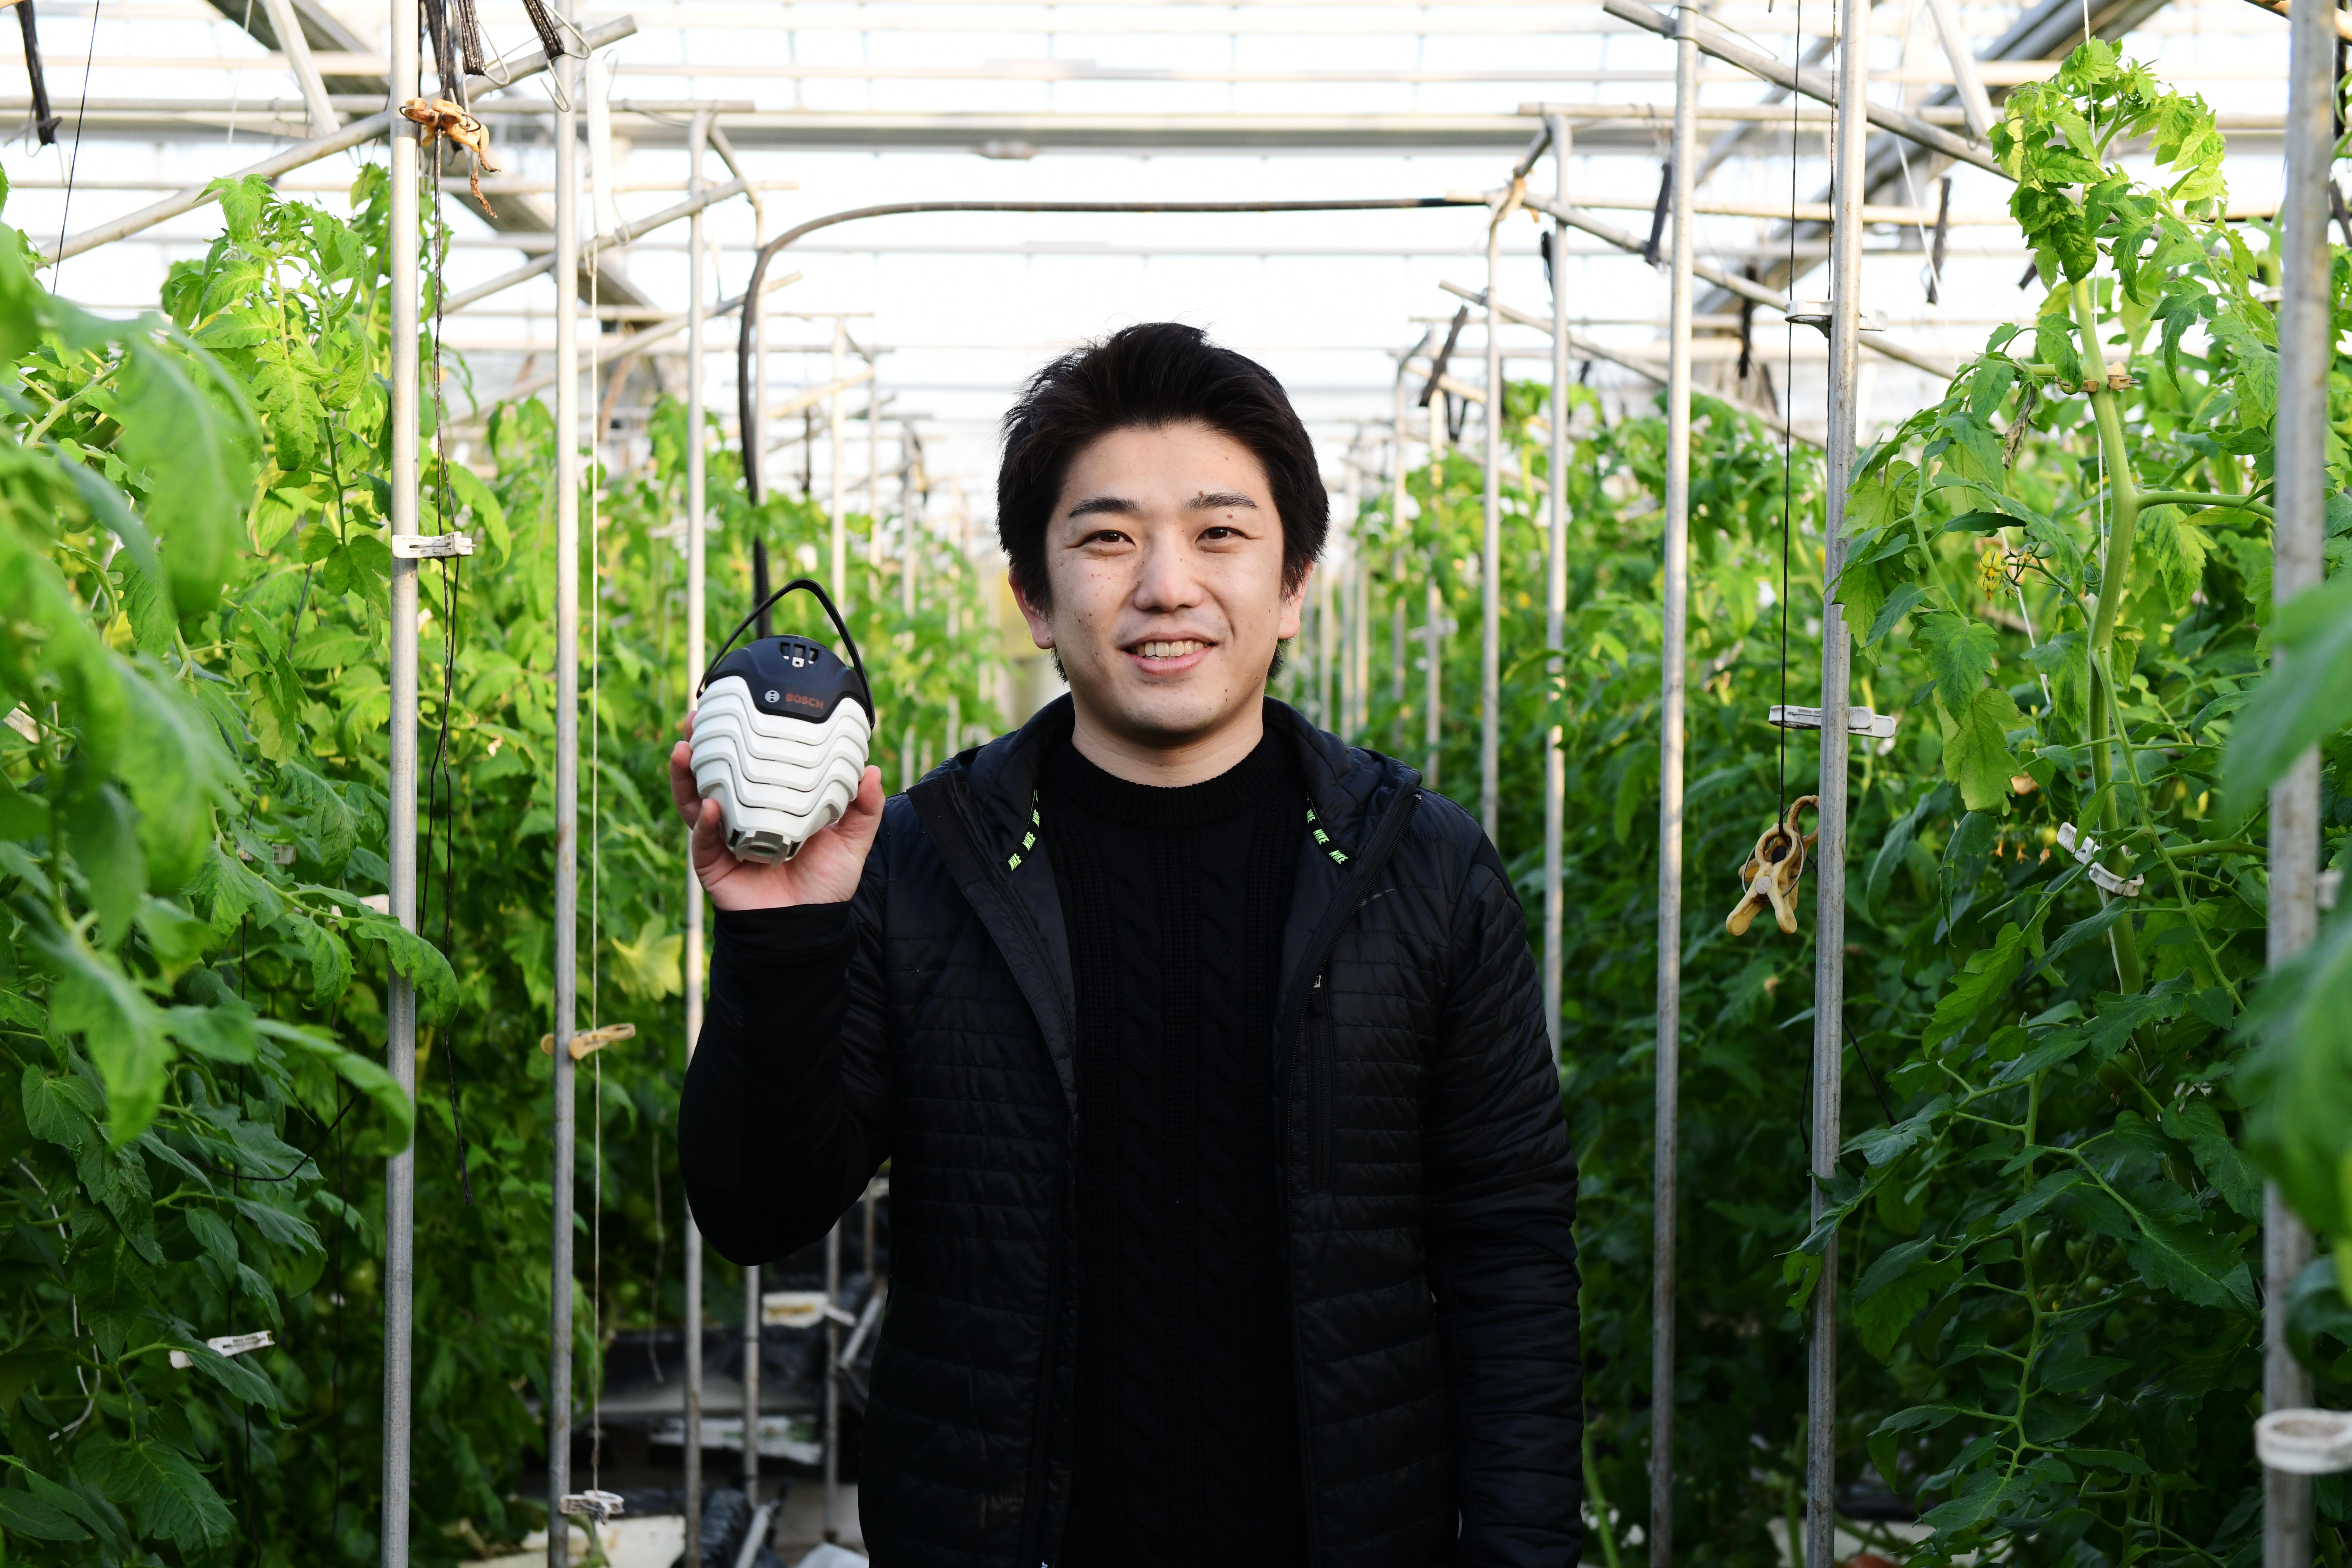 Projektleiter Ryosuke Suzuki